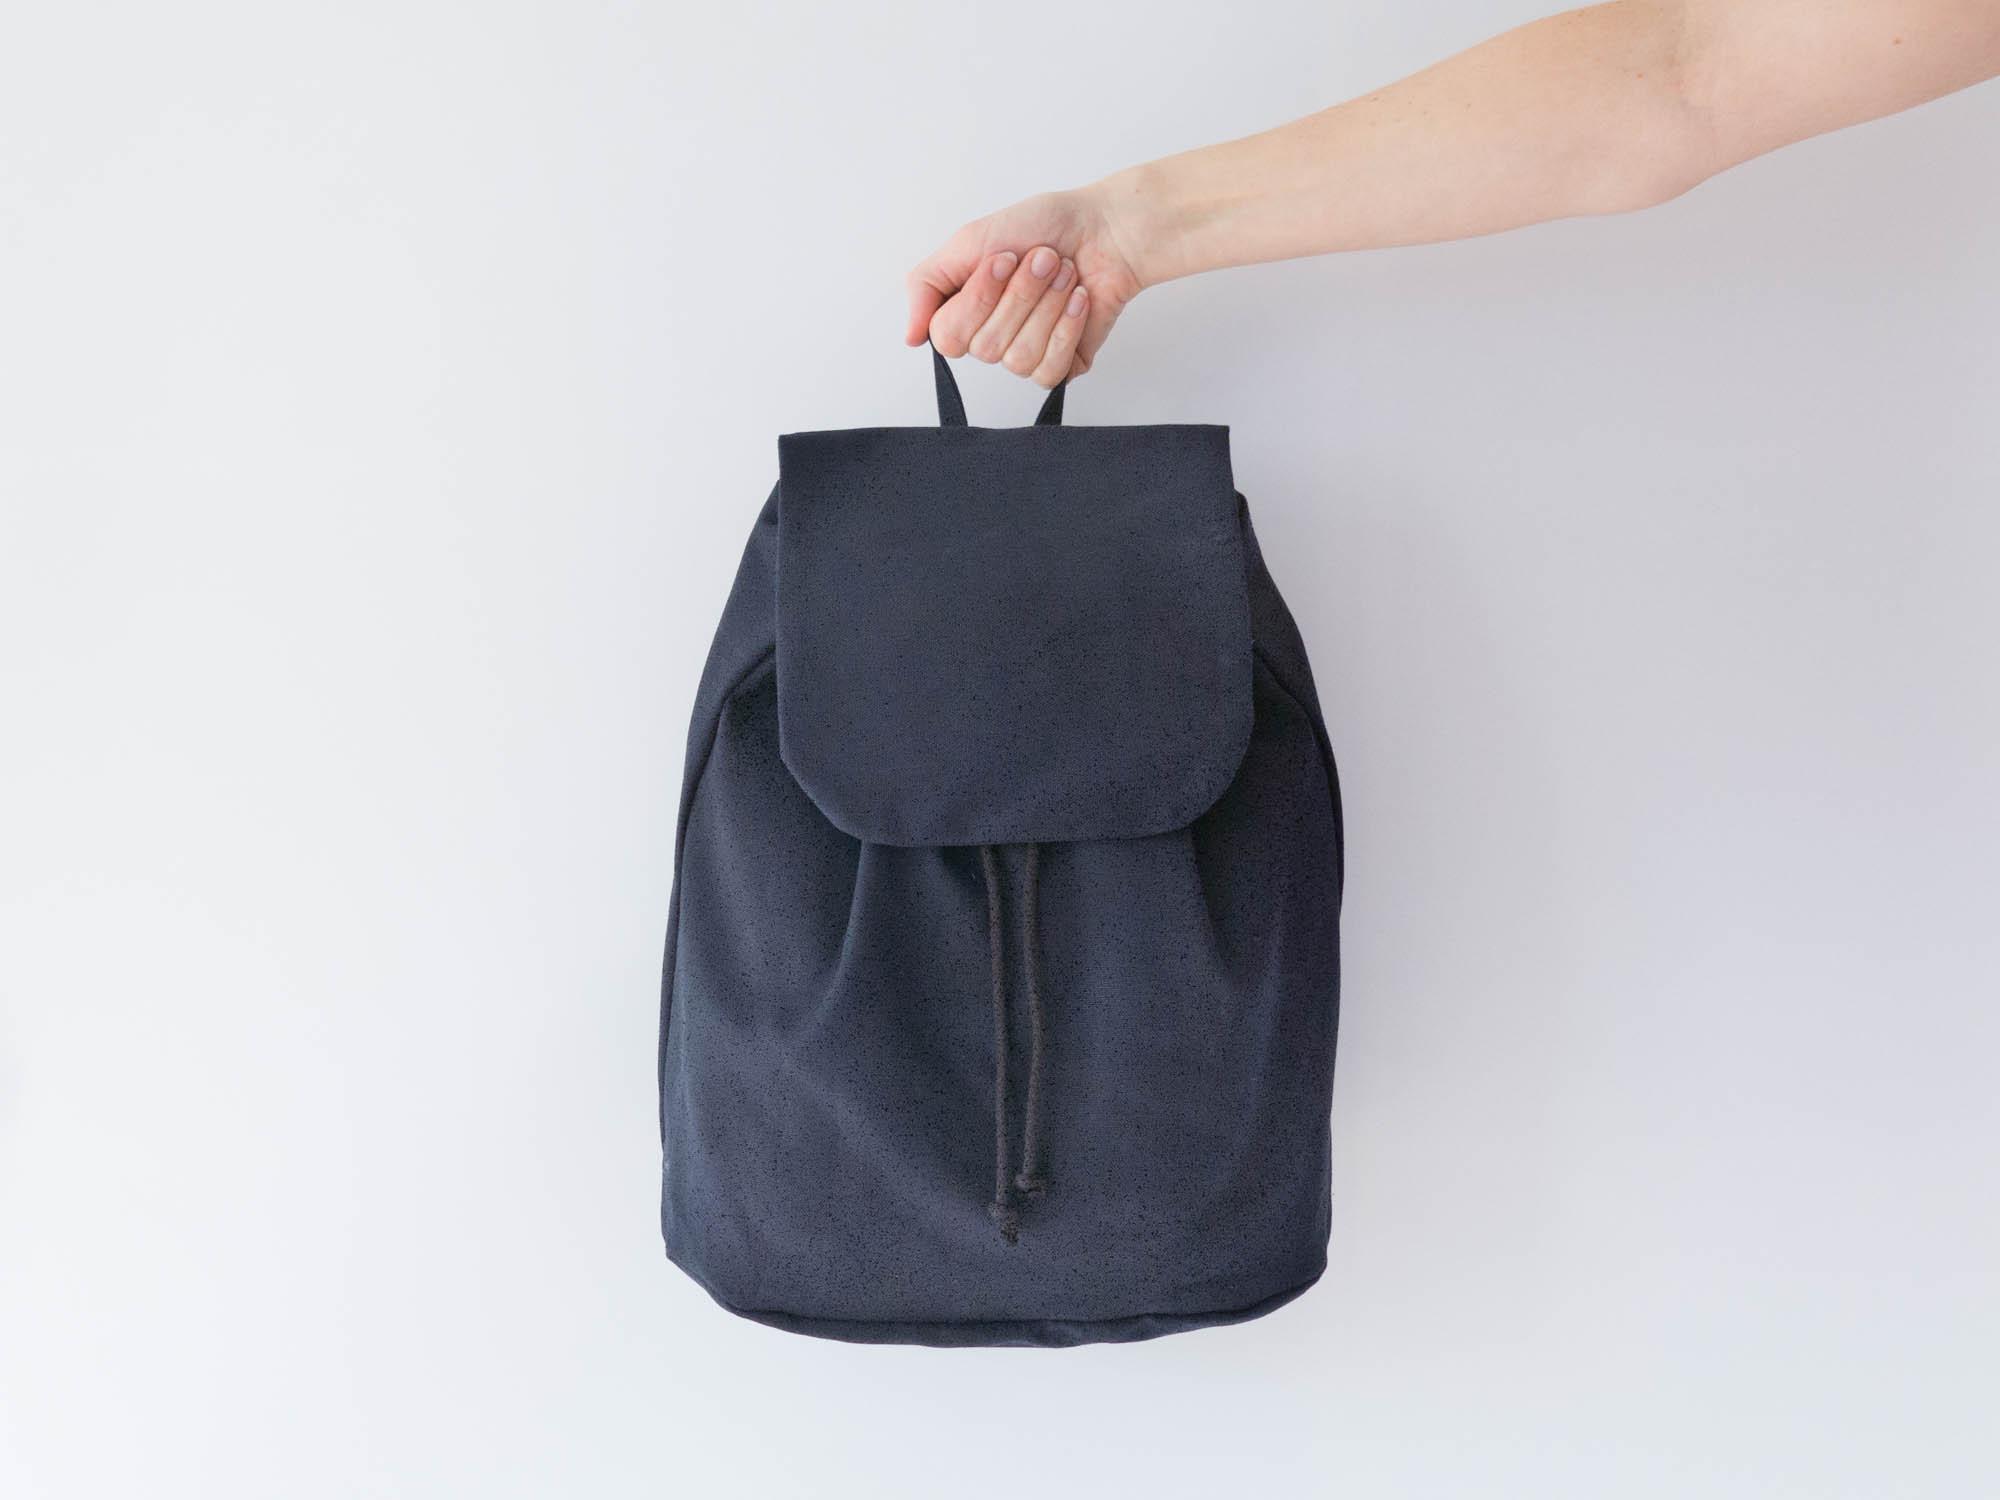 Diy Rucksack  Rucksack – DIY Sewing Academy